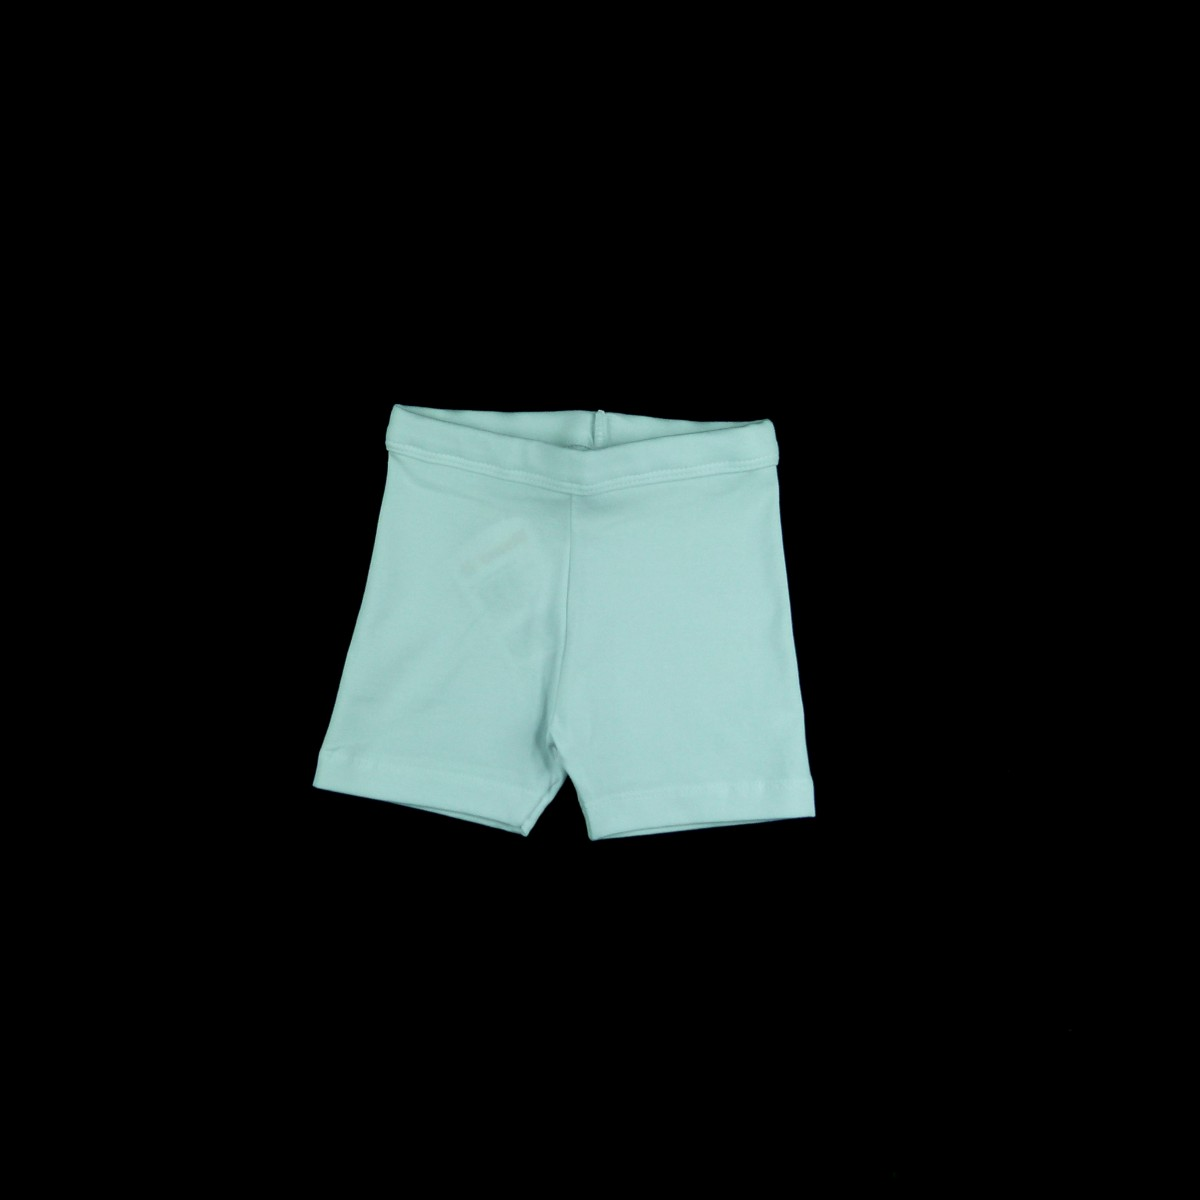 Legging Ciclista de Cotton Brandili - 035792 / 035793 / 035794 Branco